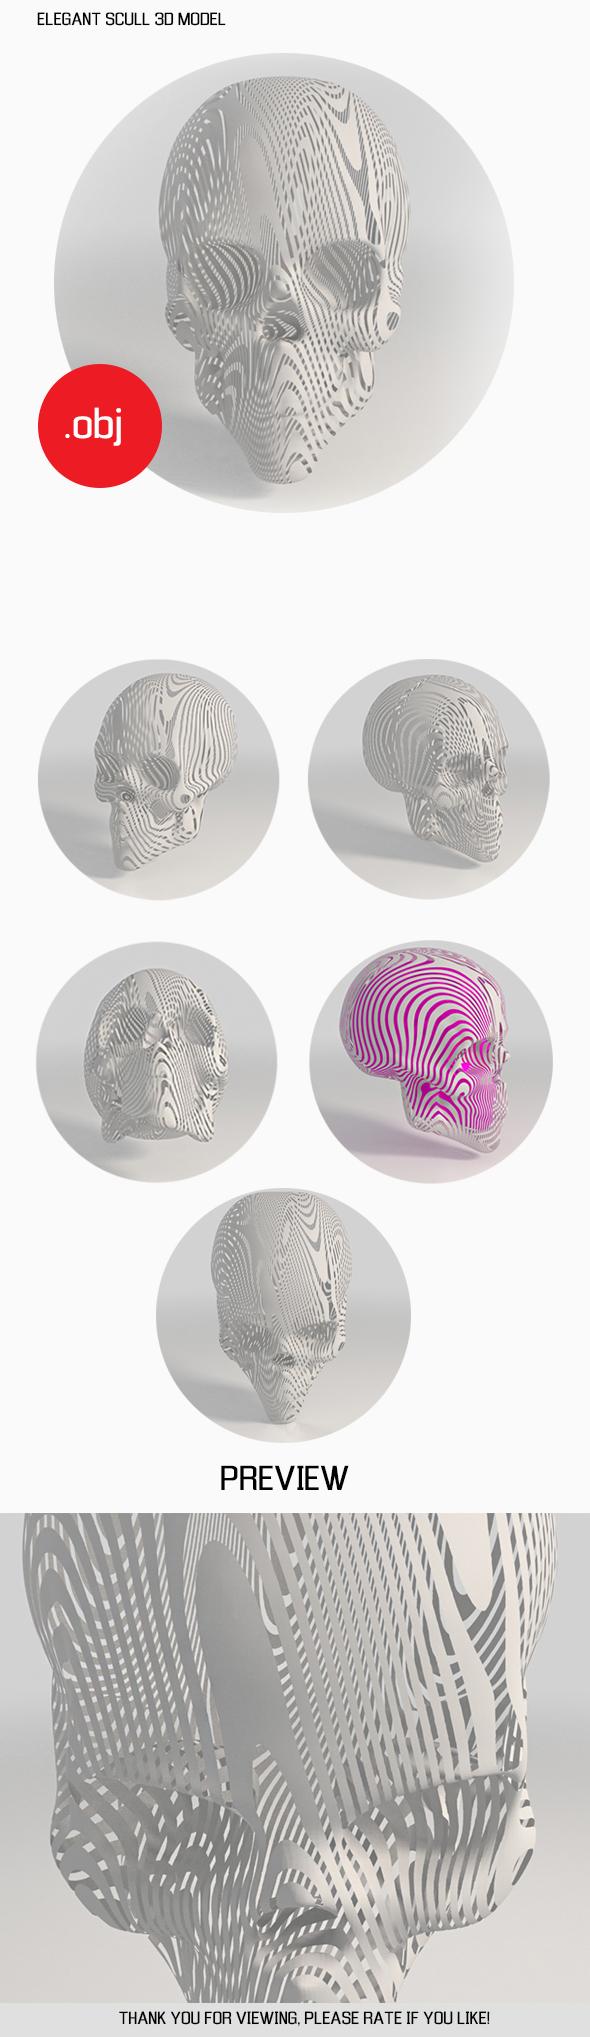 ELEGANT SCULL 3D MODEL - 3DOcean Item for Sale